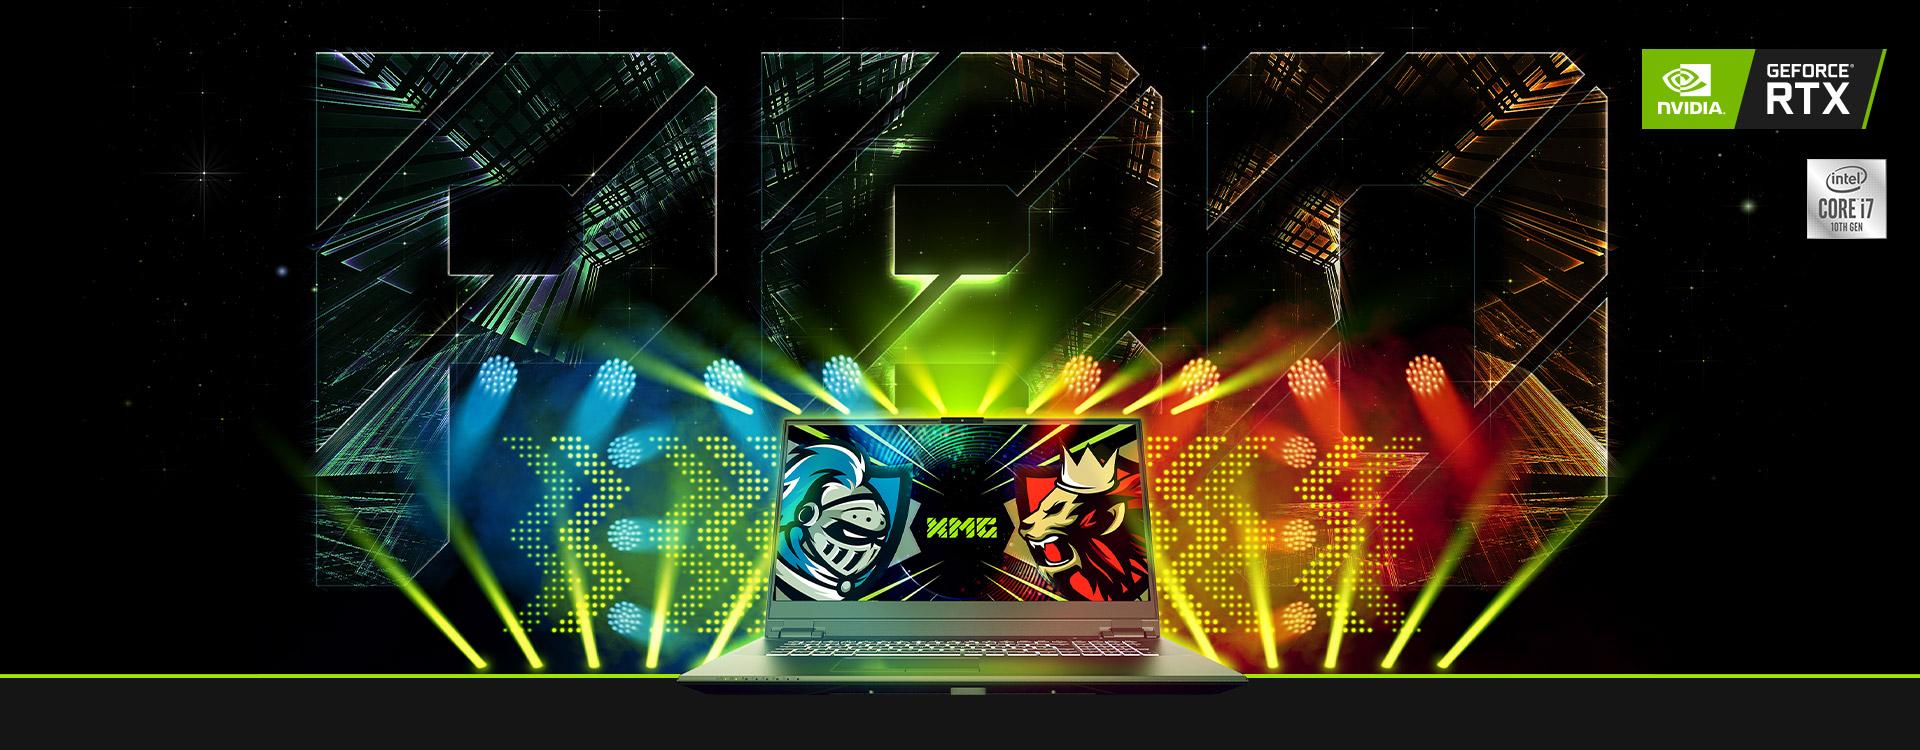 XMG PRO Gaming Laptop NVIDIA GeForce RTX